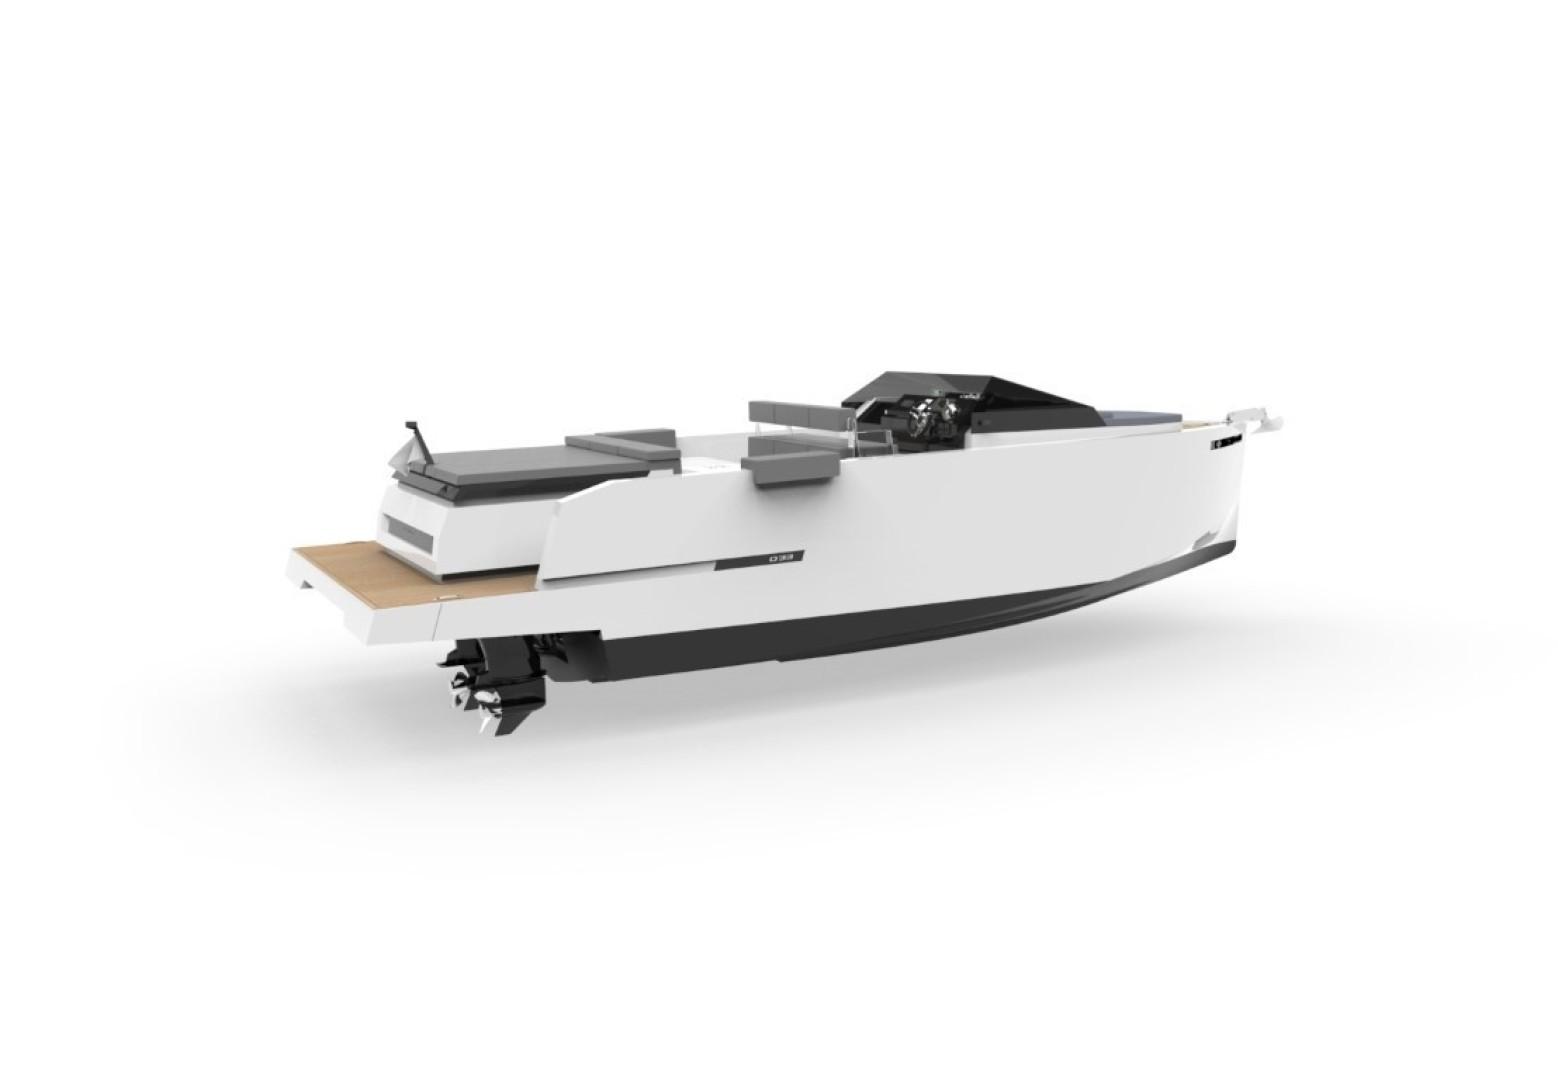 De Antonio-D34 Cruiser 2020-De Antonio Yachts D34 Cruiser Fort Lauderdale-Florida-United States-De Antonio Yachts_D34 Cruiser_layout 02-1549249 | Thumbnail